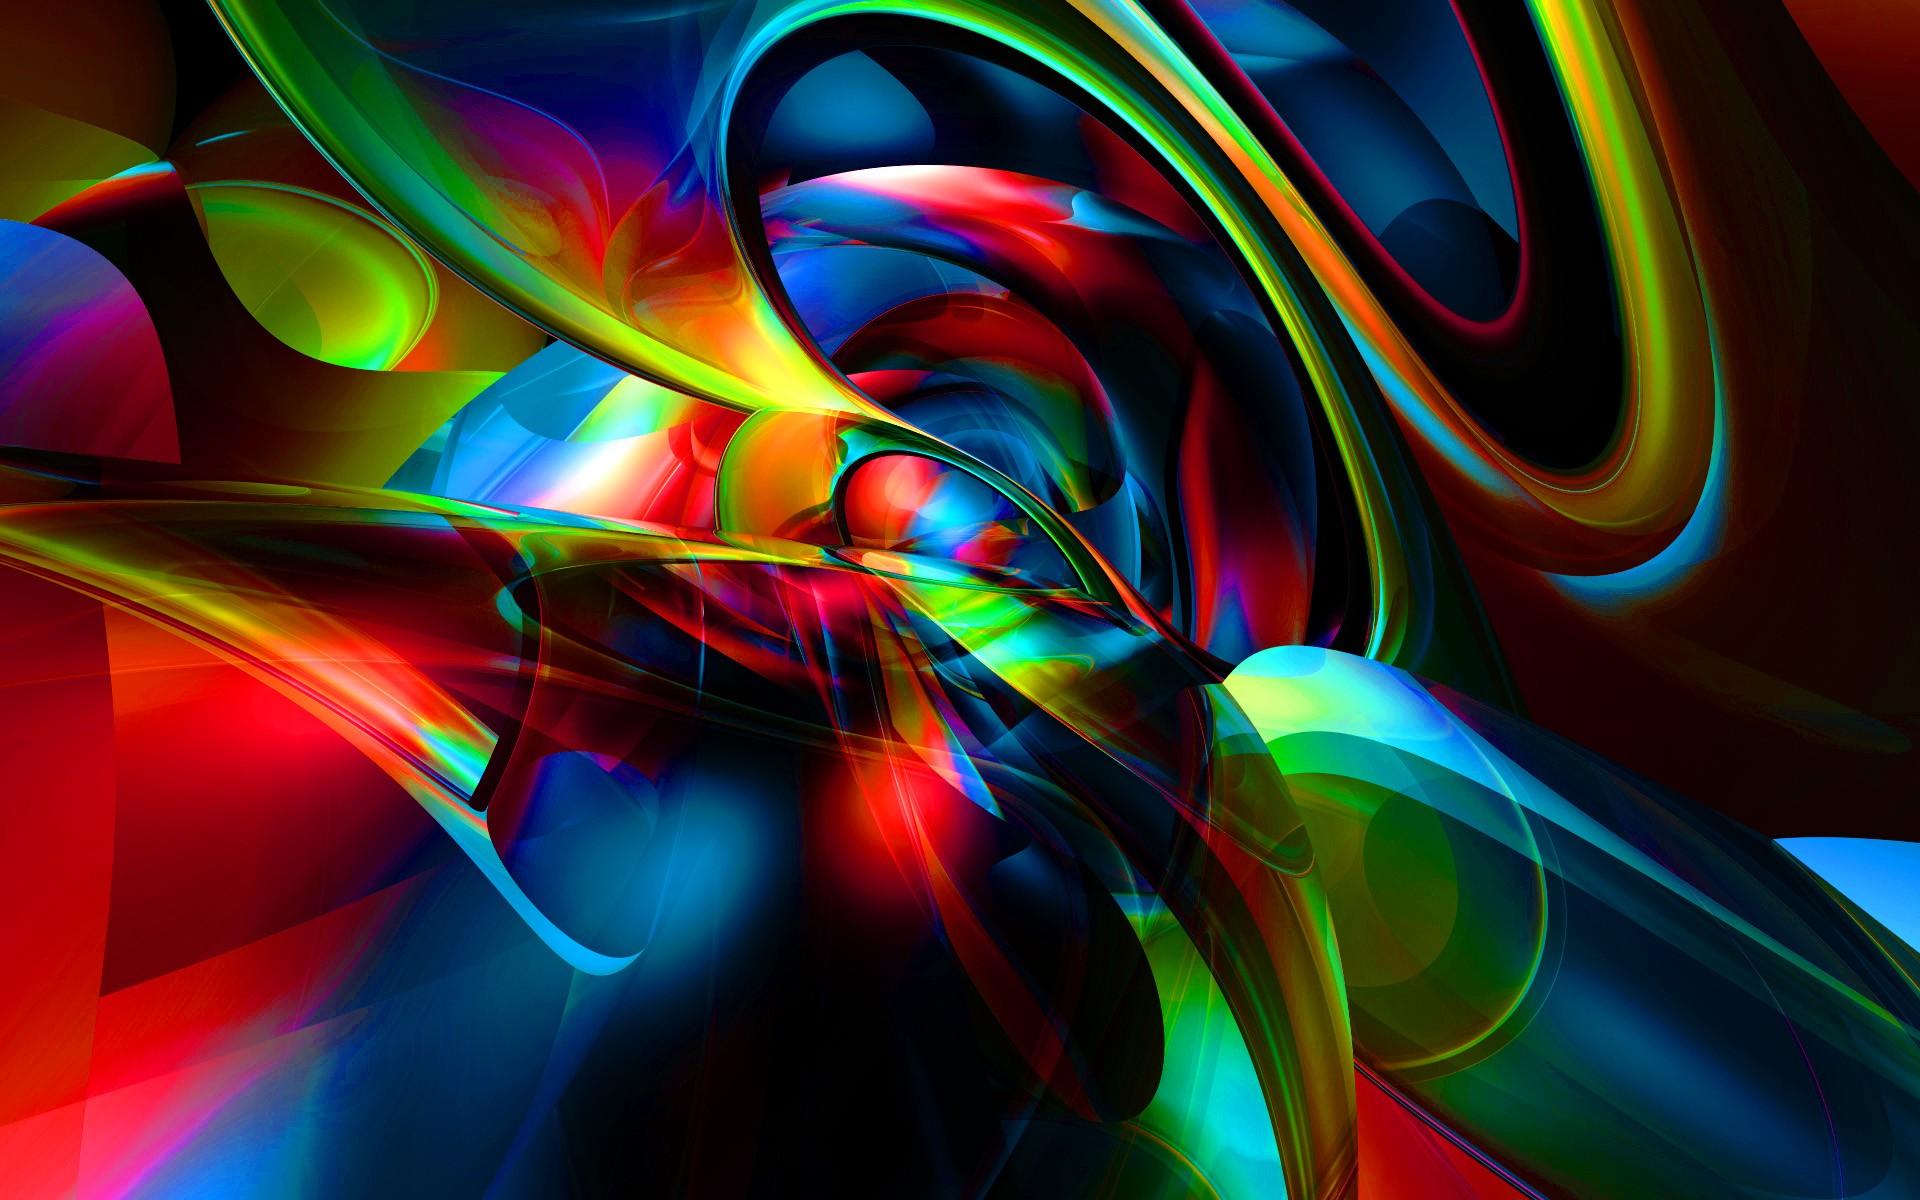 Multicolor wallpaper | 1920x1200 | 198983 | WallpaperUP